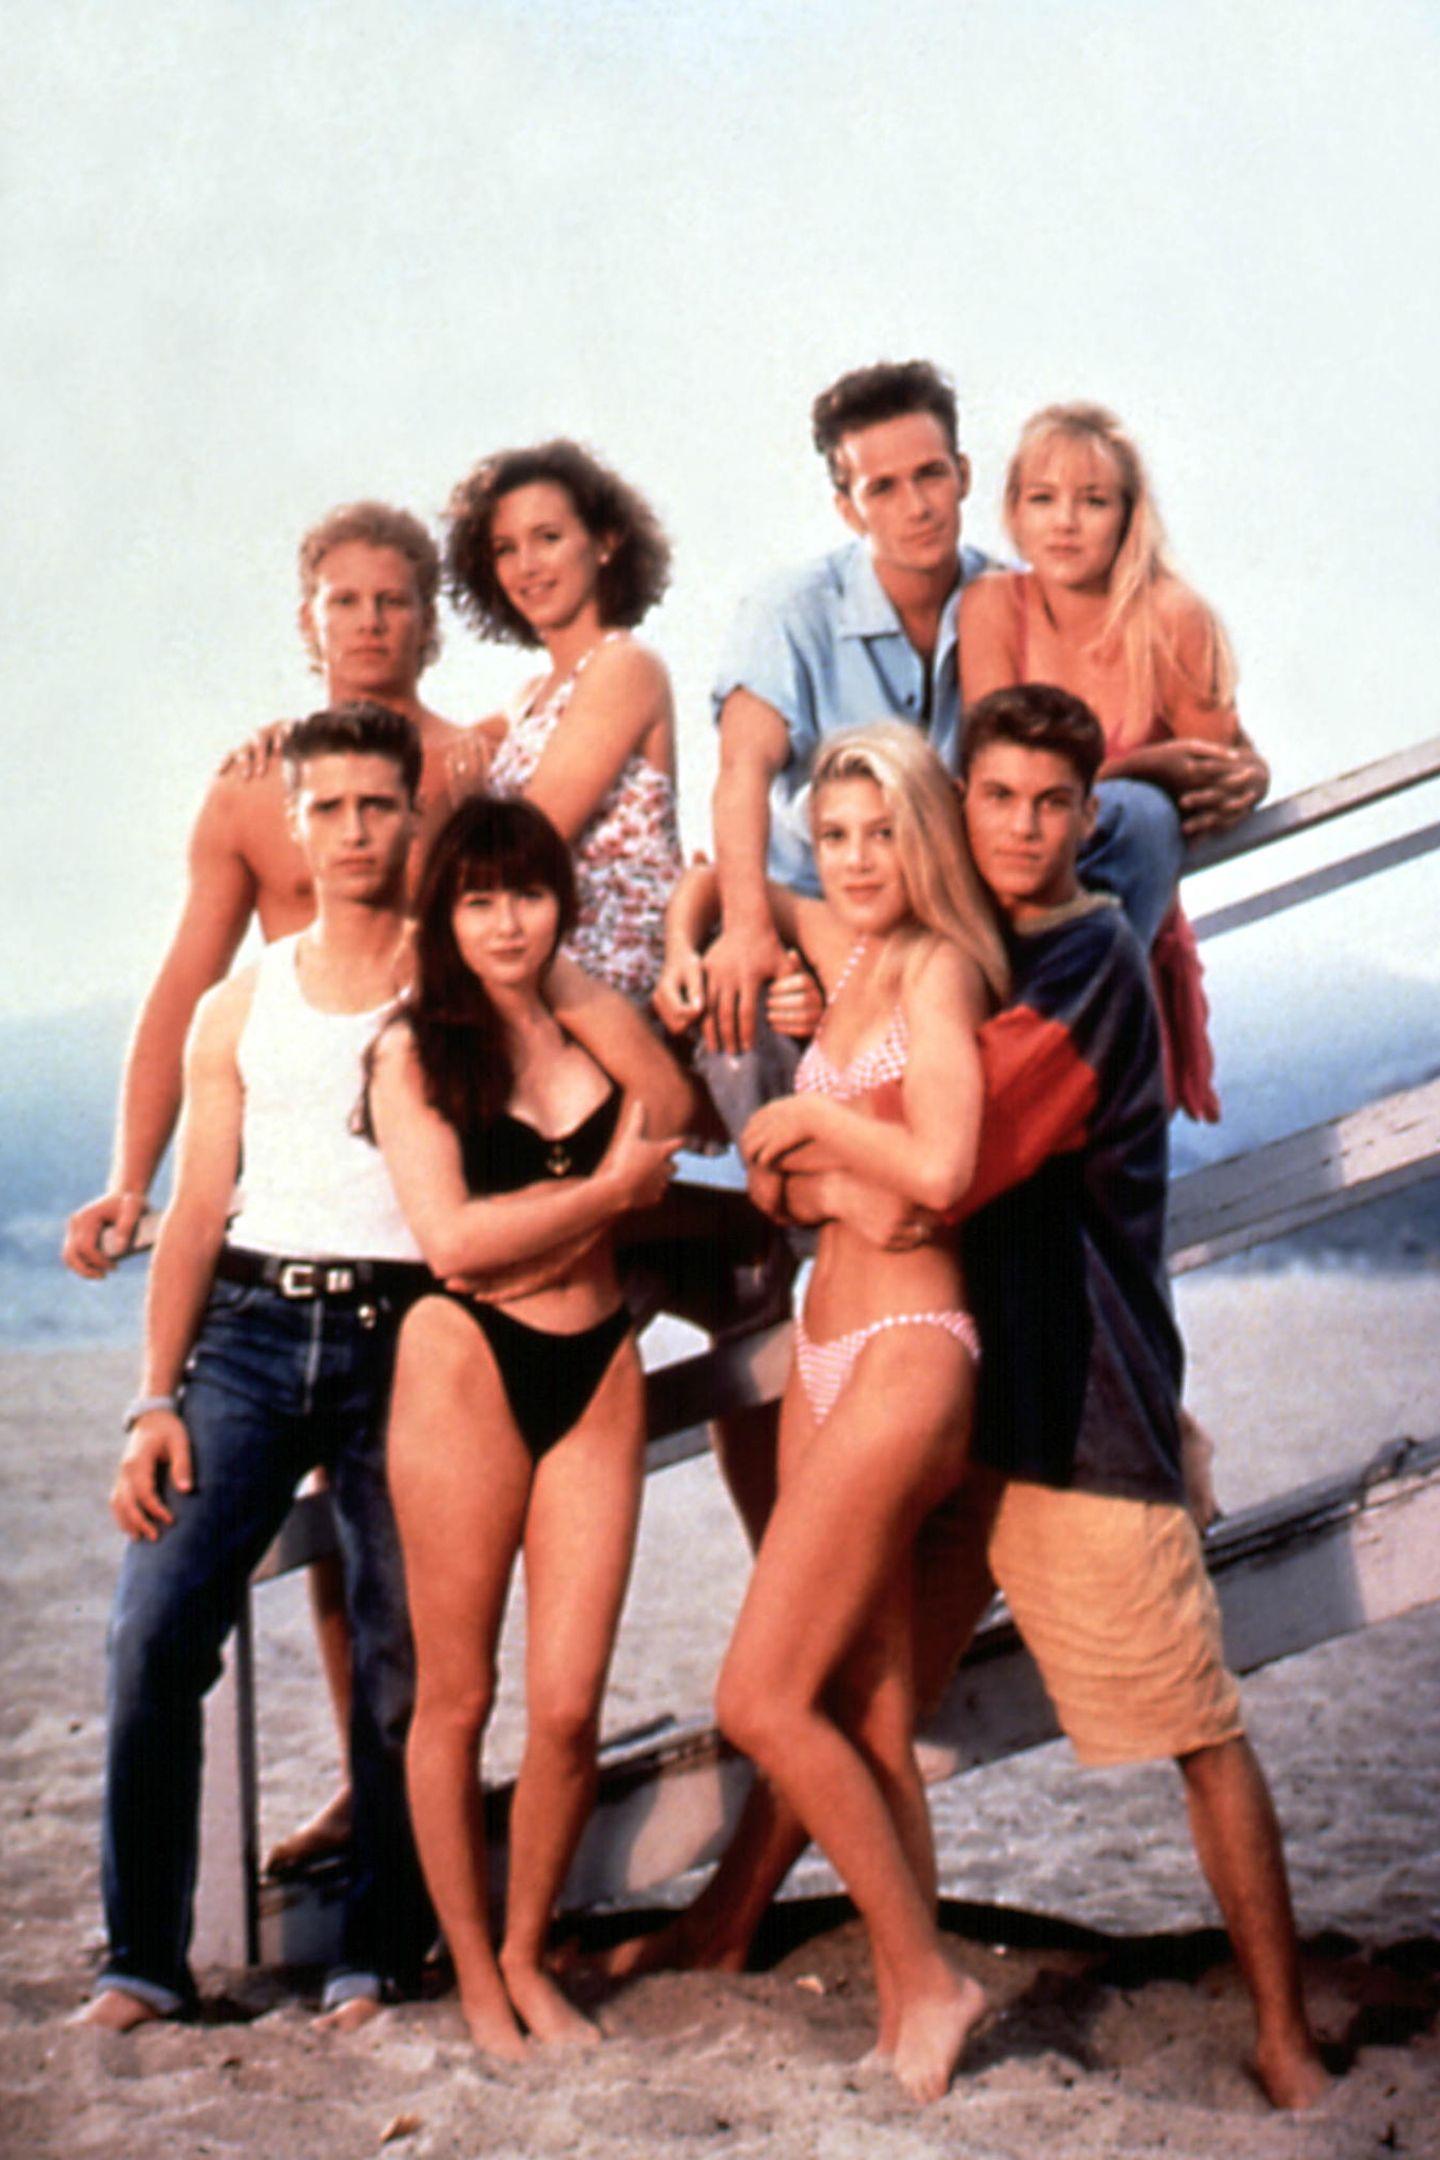 Ian Ziering, Gabrielle Carteris, Luke Perry, Jennie Garth, Jason Priestley, Shannen Doherty, Tori Spelling, Brian Austin Green